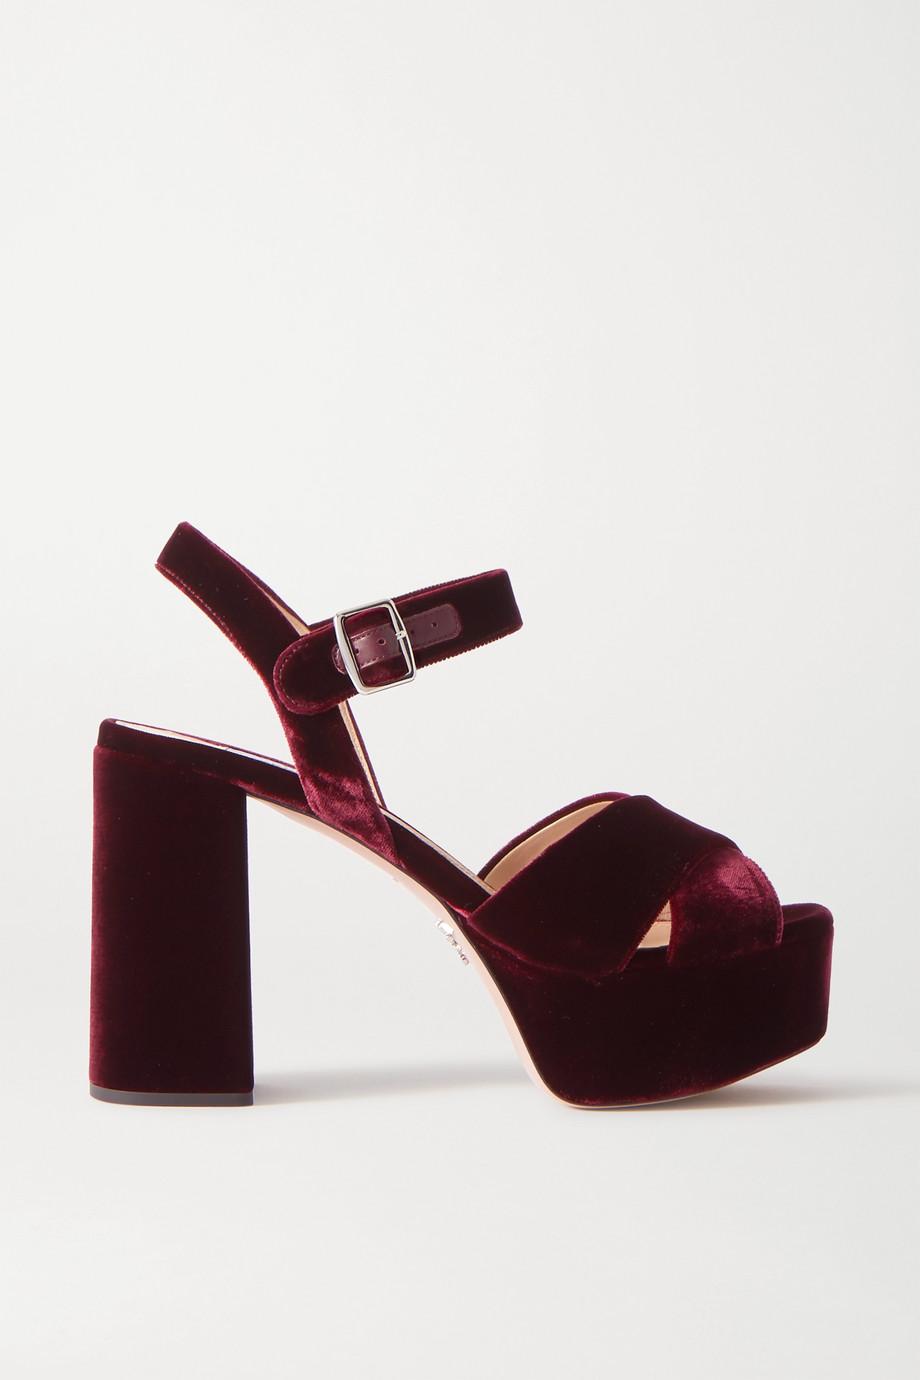 Prada Sandales plates-formes en velours